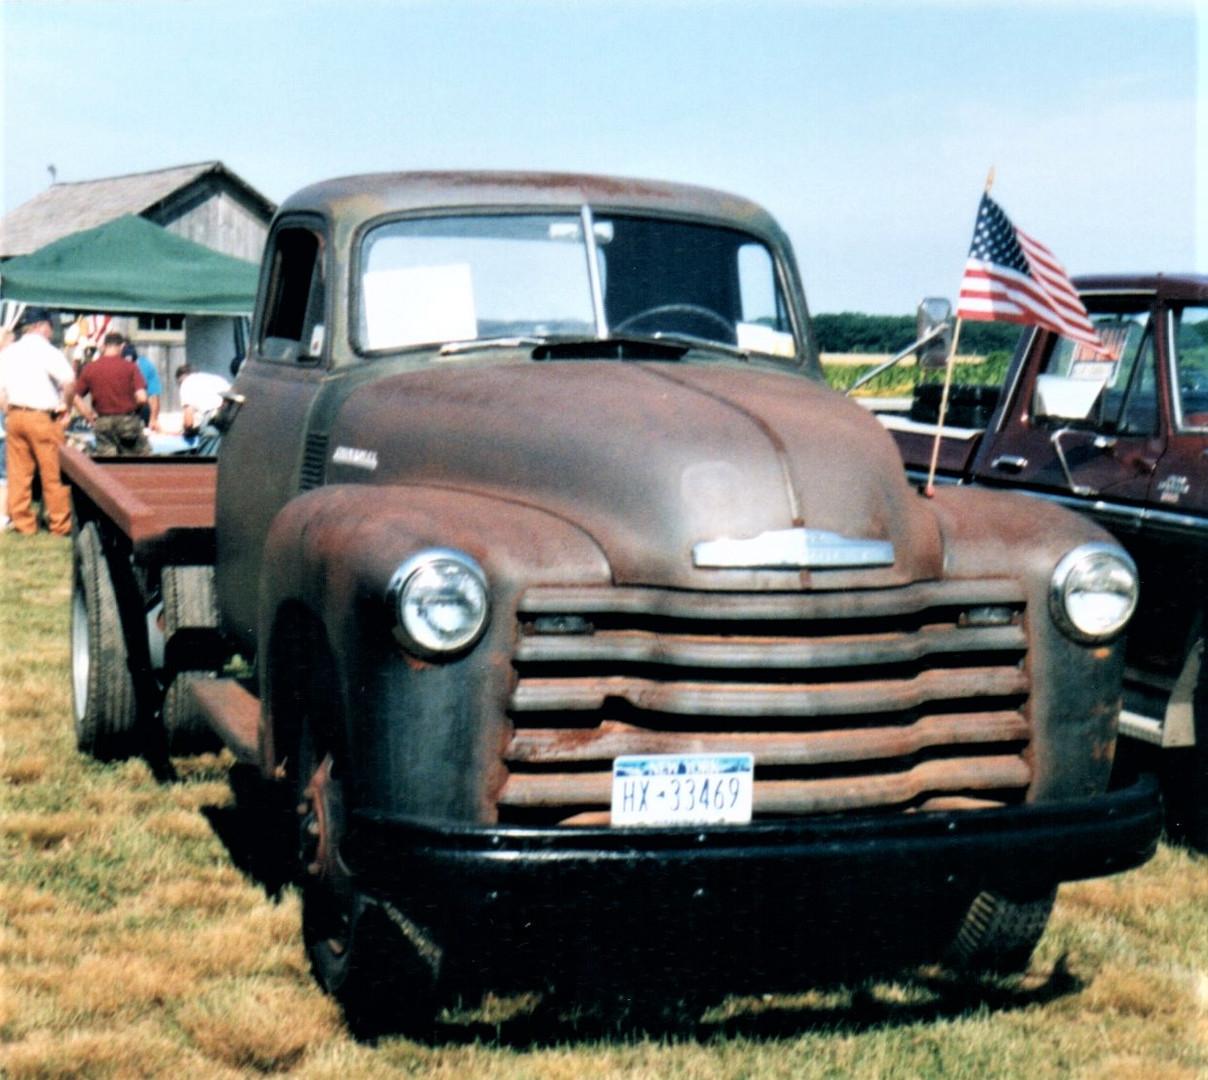 1952 Chevrolet 6100 flatbed - George Flaig